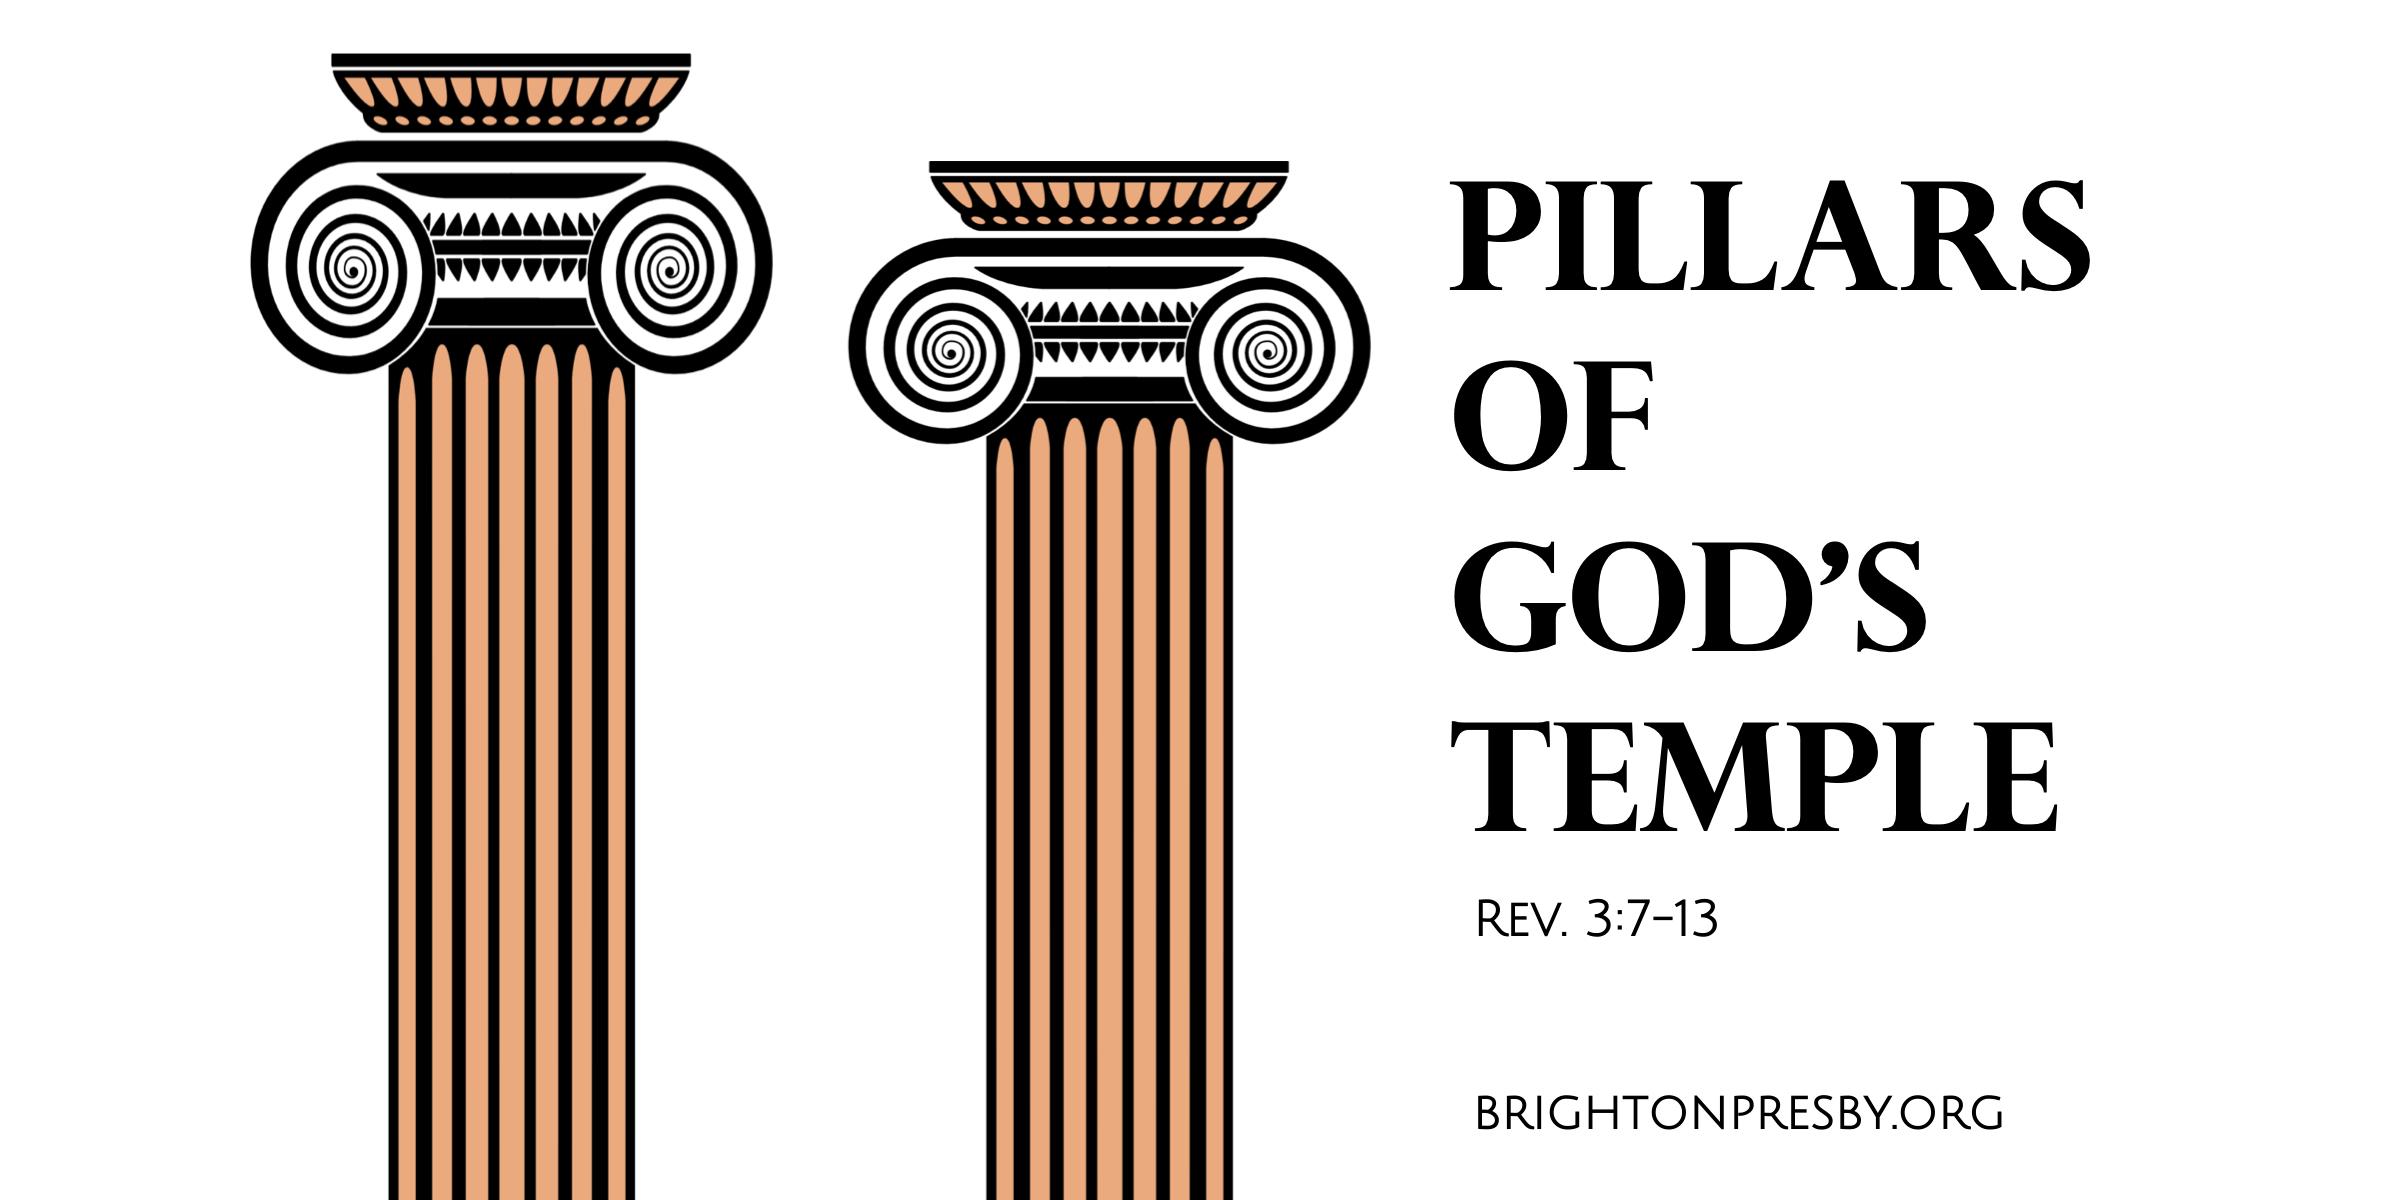 Pillars of God's Temple (Revelation Series Part 8)